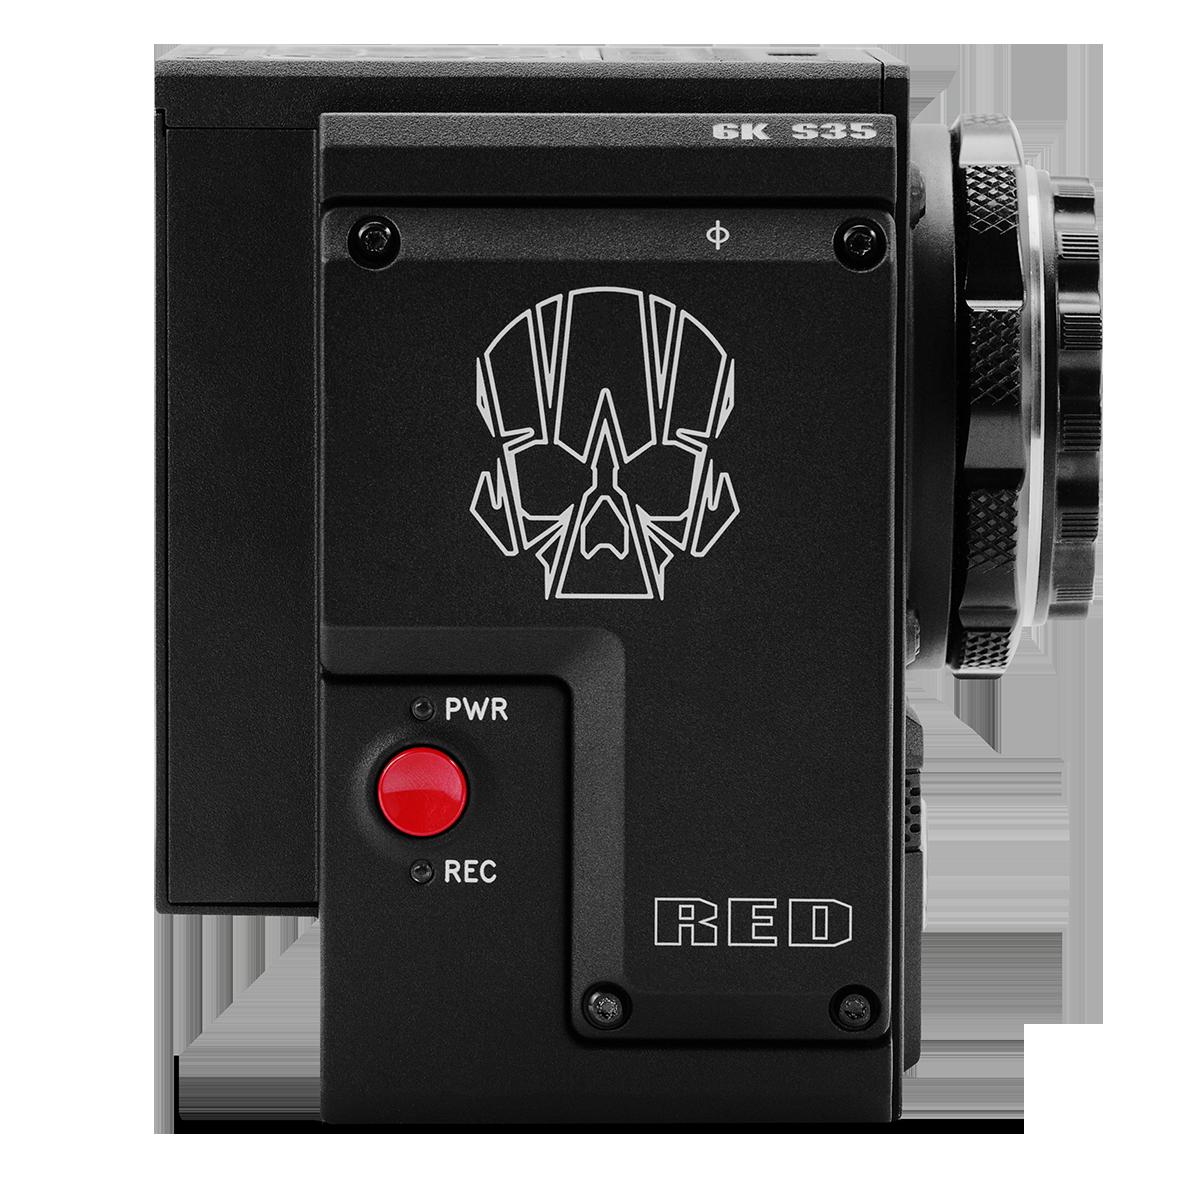 RED Dragon-X 6K S35